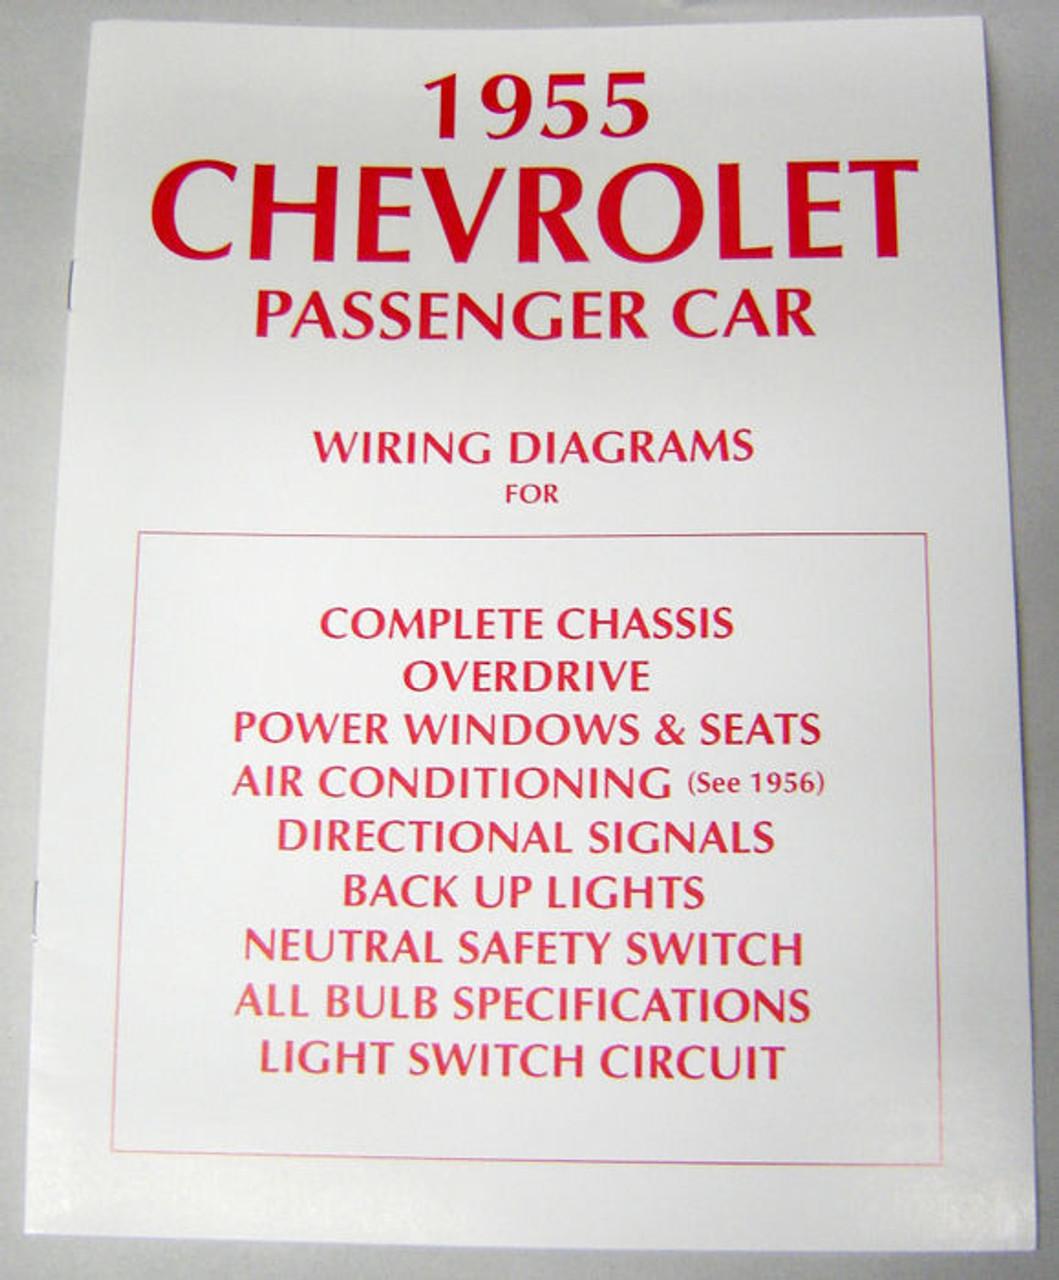 L1000_zpsbamkugxp__90195.1443295376?c\\\=2 2003 chevy suburban radio wiring diagram wiring diagram Chevy Trailblazer Radio Wiring Diagram at crackthecode.co